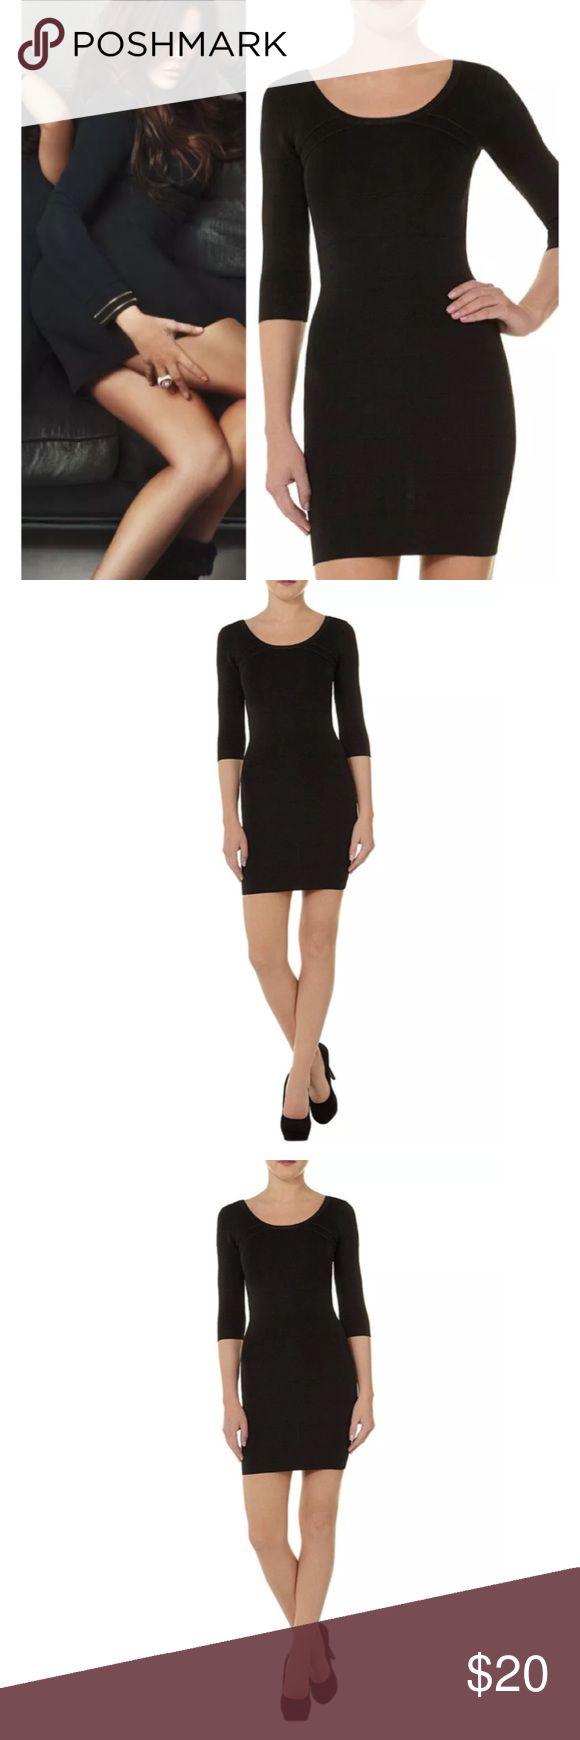 Kardashian Kollection Black Bandage Bodycon Dress UK size 16, US size 12 Kardashian Kollection Dresses Mini